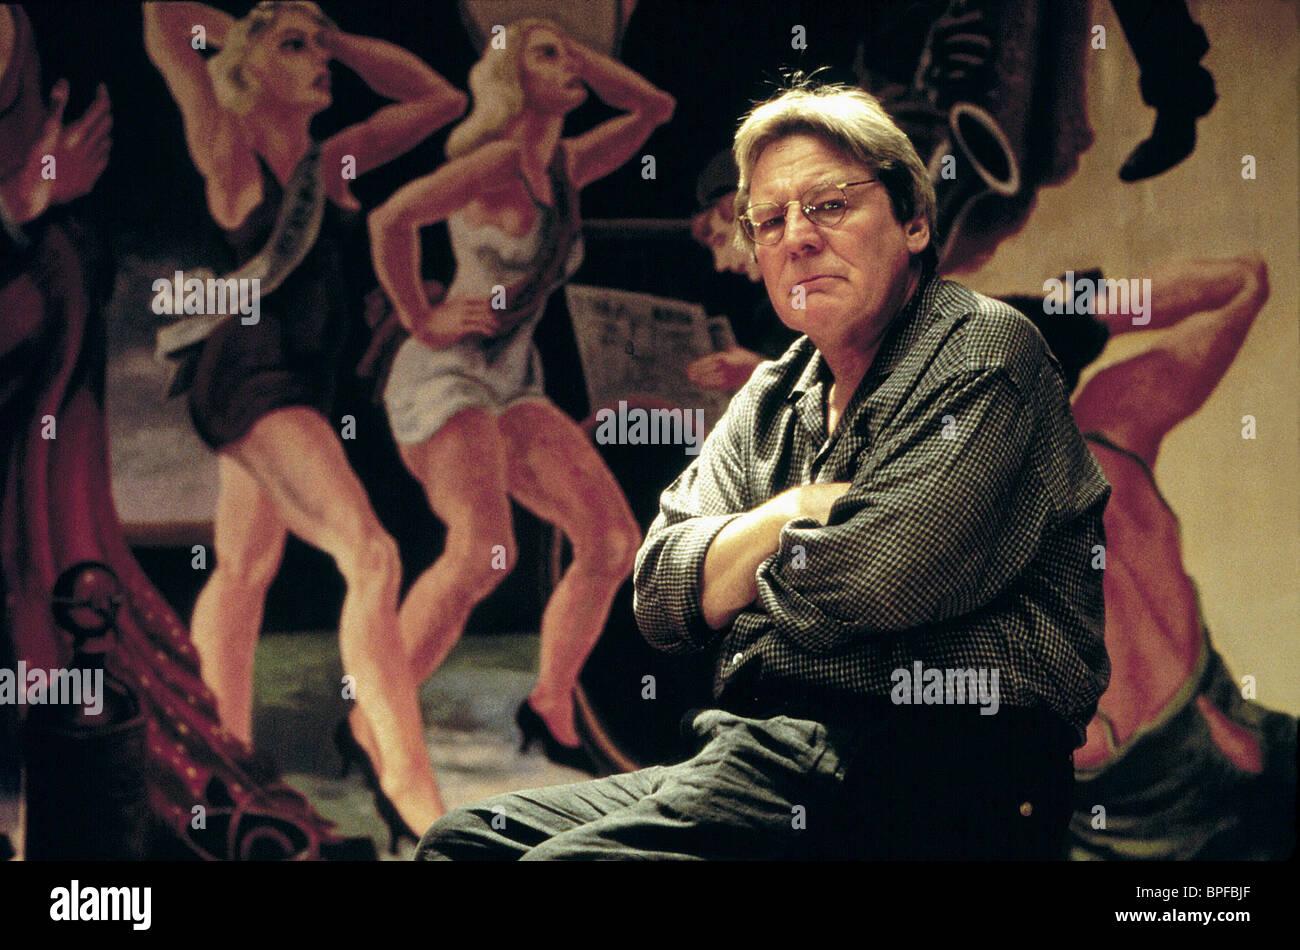 ALAN PARKER EVITA (1996) - Stock Image